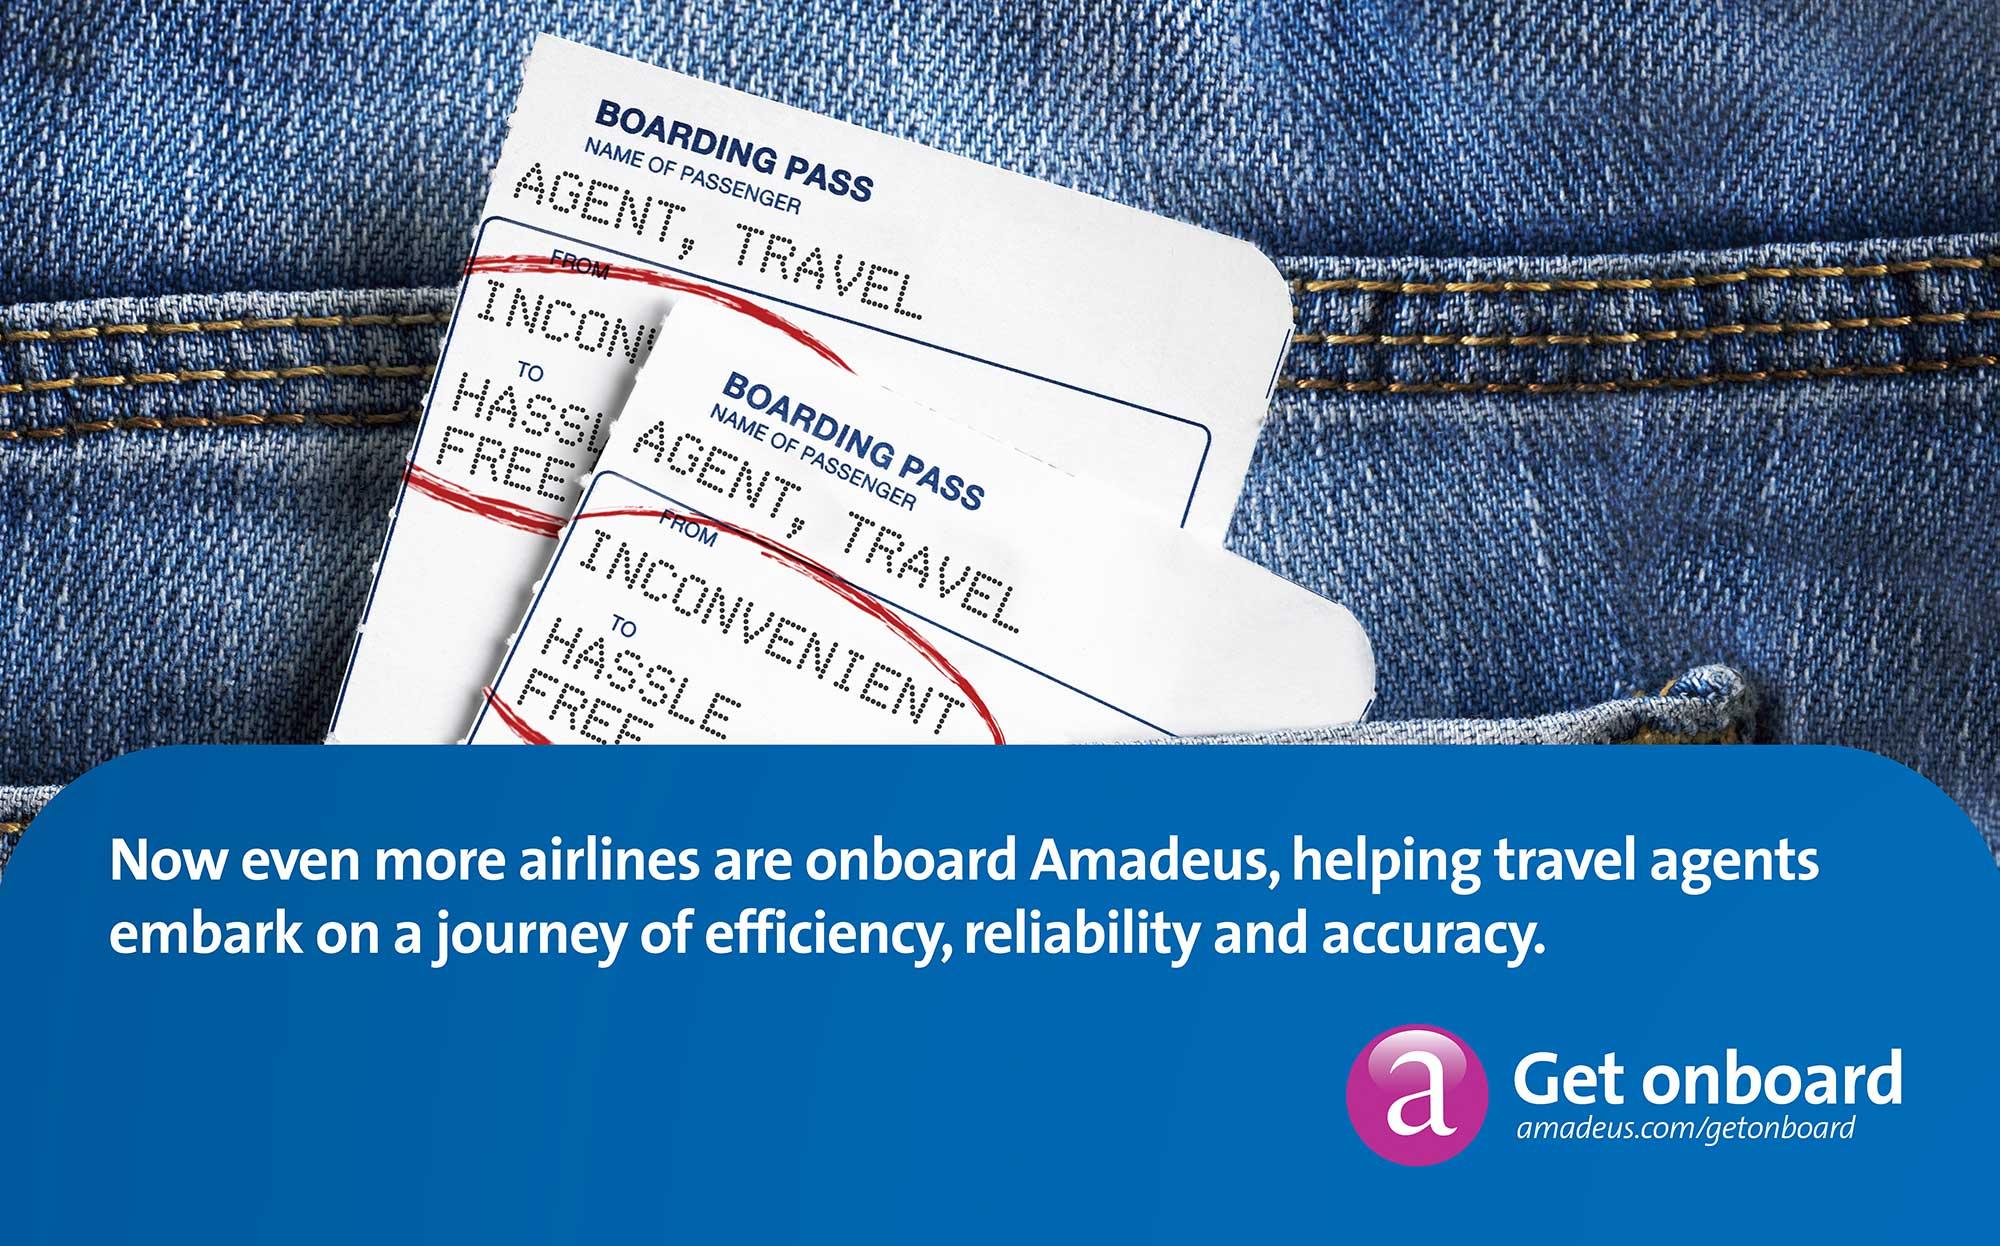 Amadeus Advertising Boarding Pass